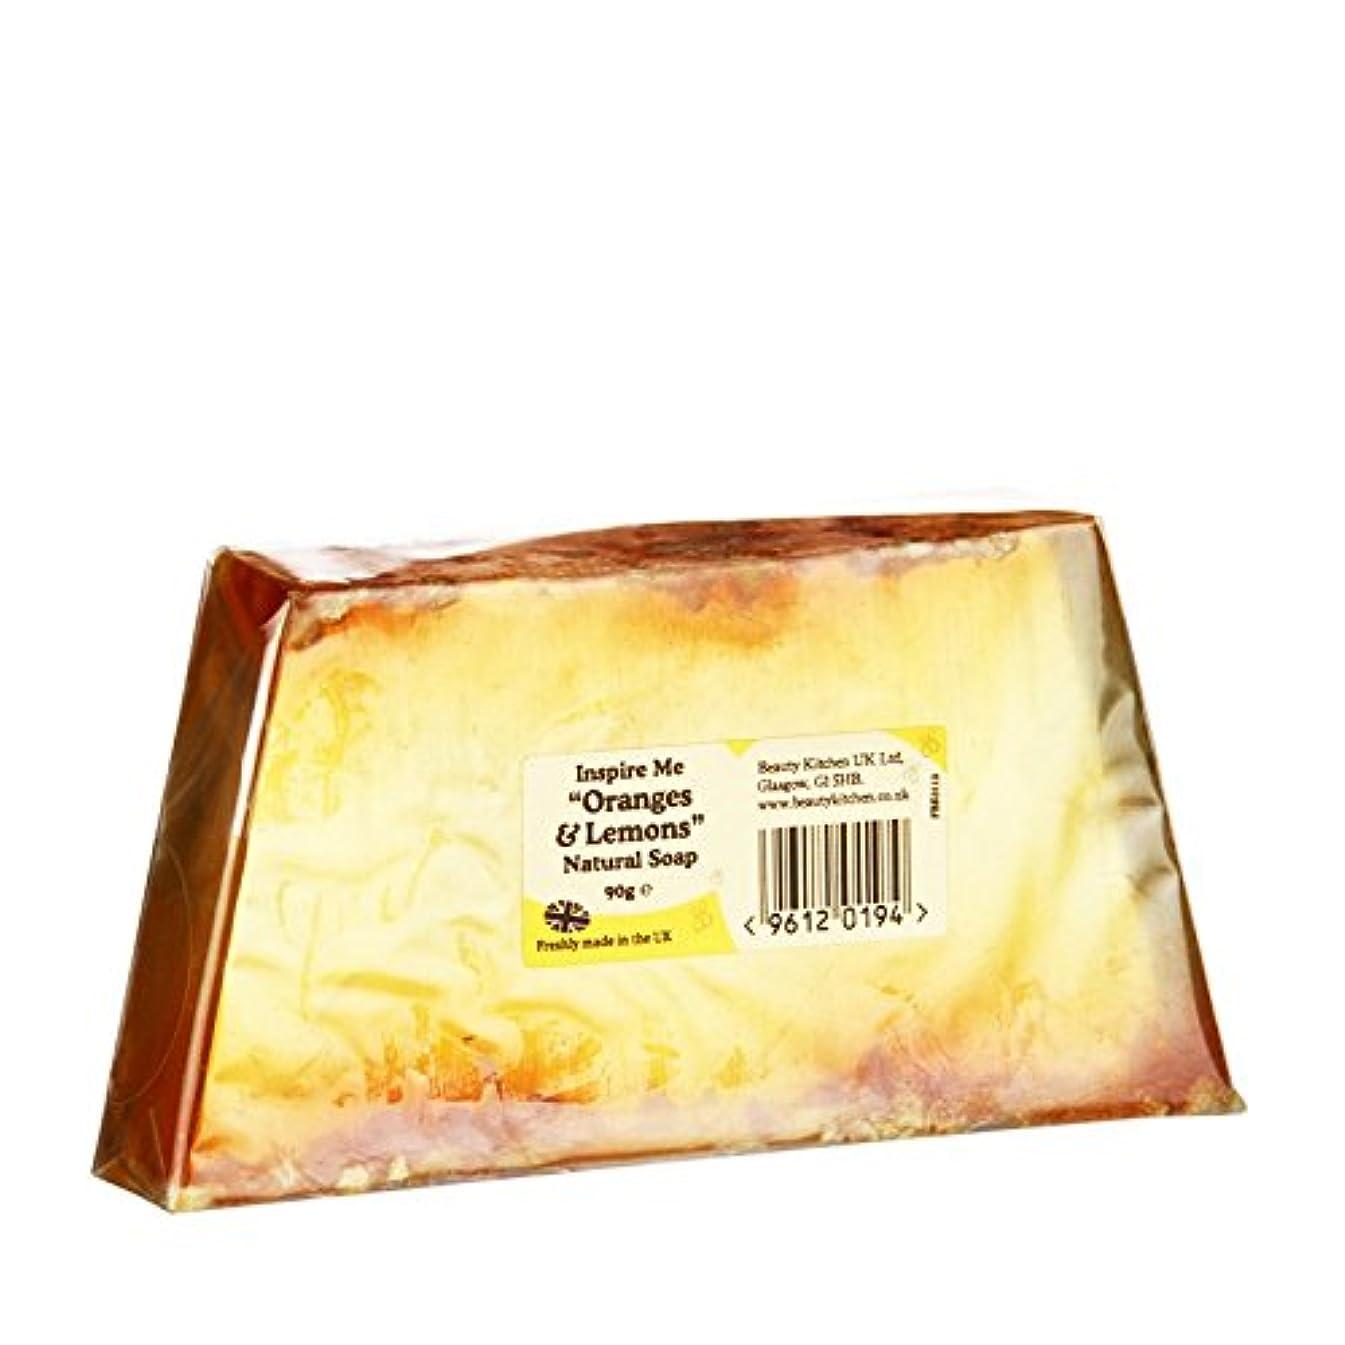 Beauty Kitchen Inspire Me Orange & Lemon Natural Soap 90g (Pack of 6) - 美しさのキッチンは私がオレンジ&レモンの天然石鹸90グラム鼓舞します (x6...